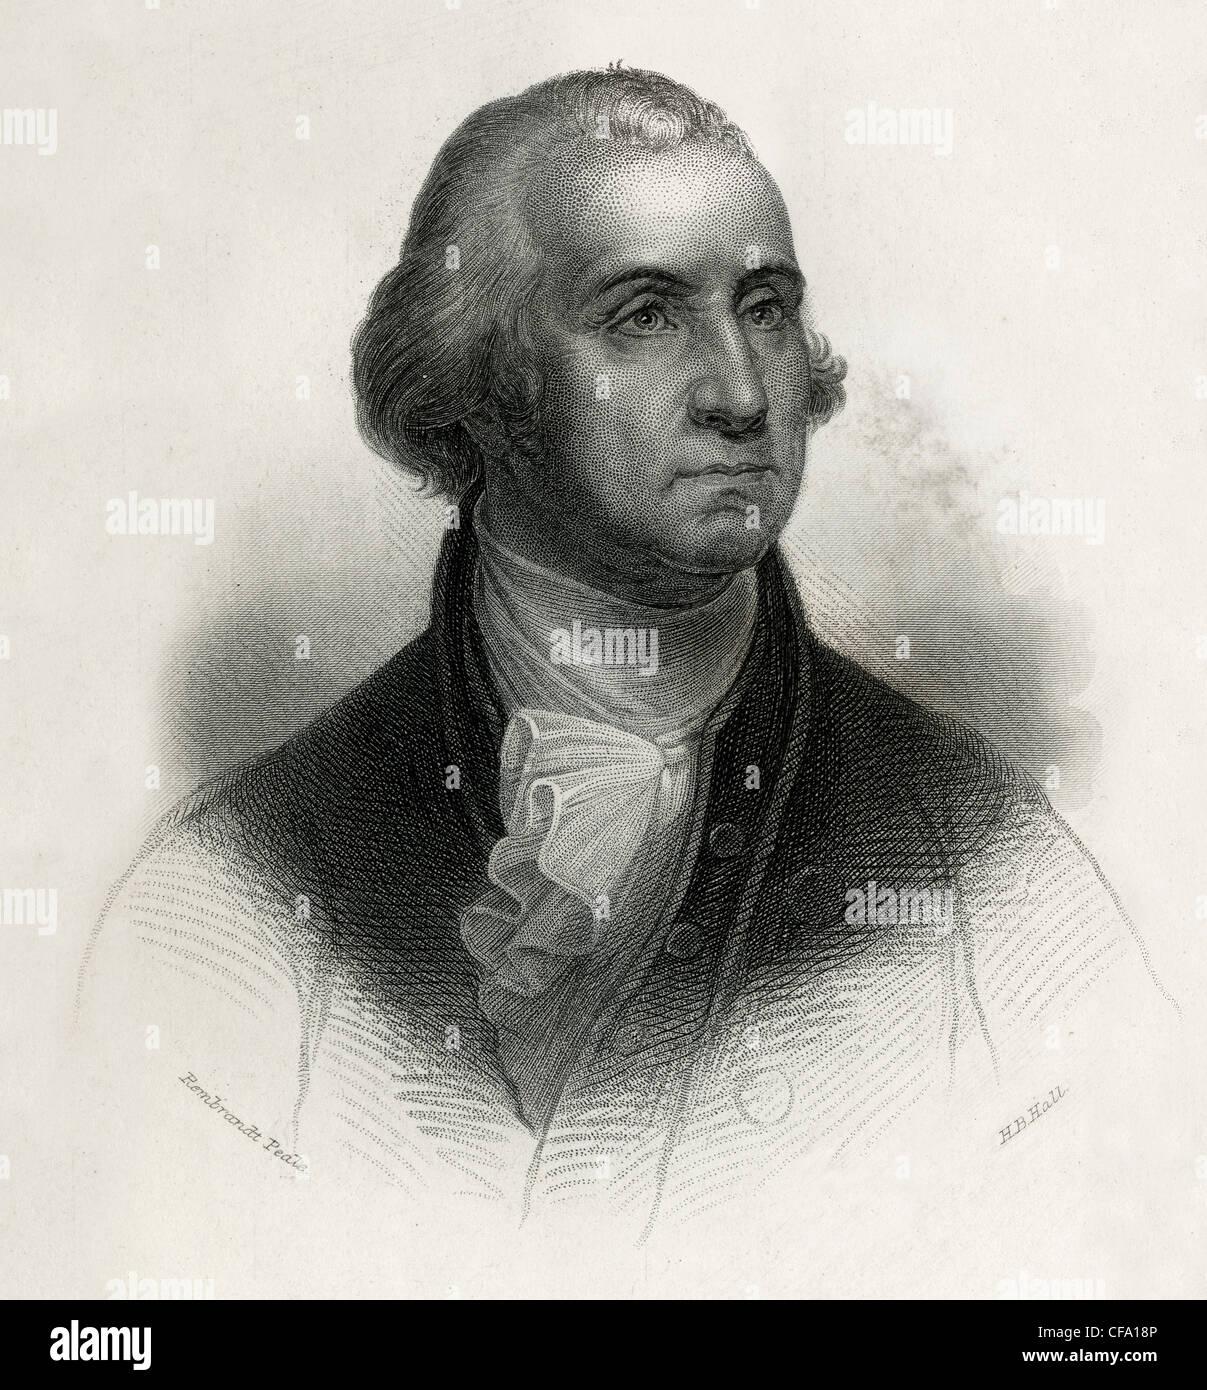 George Washington Engraving Imágenes De Stock & George Washington ...